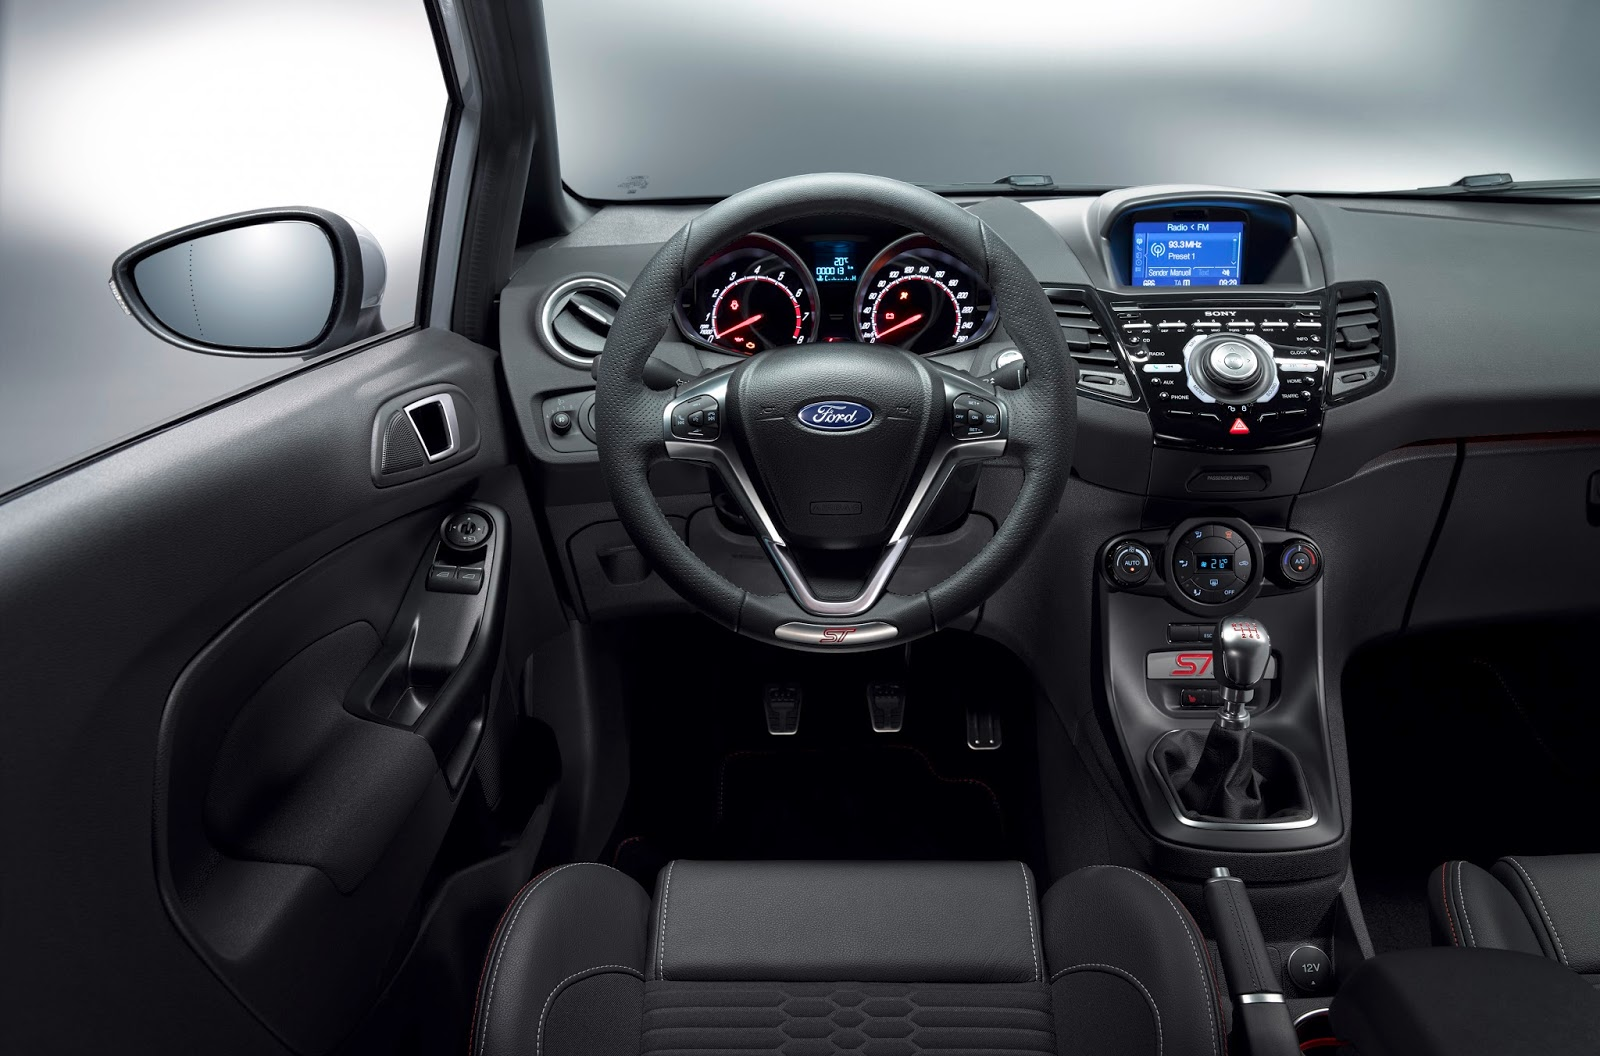 FordGeneva2016 FiestaST200 06 Το Ford Fiesta ST διαθέσιμο σε 5θυρη έκδοση Ford, Ford Fiesta, Ford Fiesta ST, Hatcback, videos, αγορά, τιμες